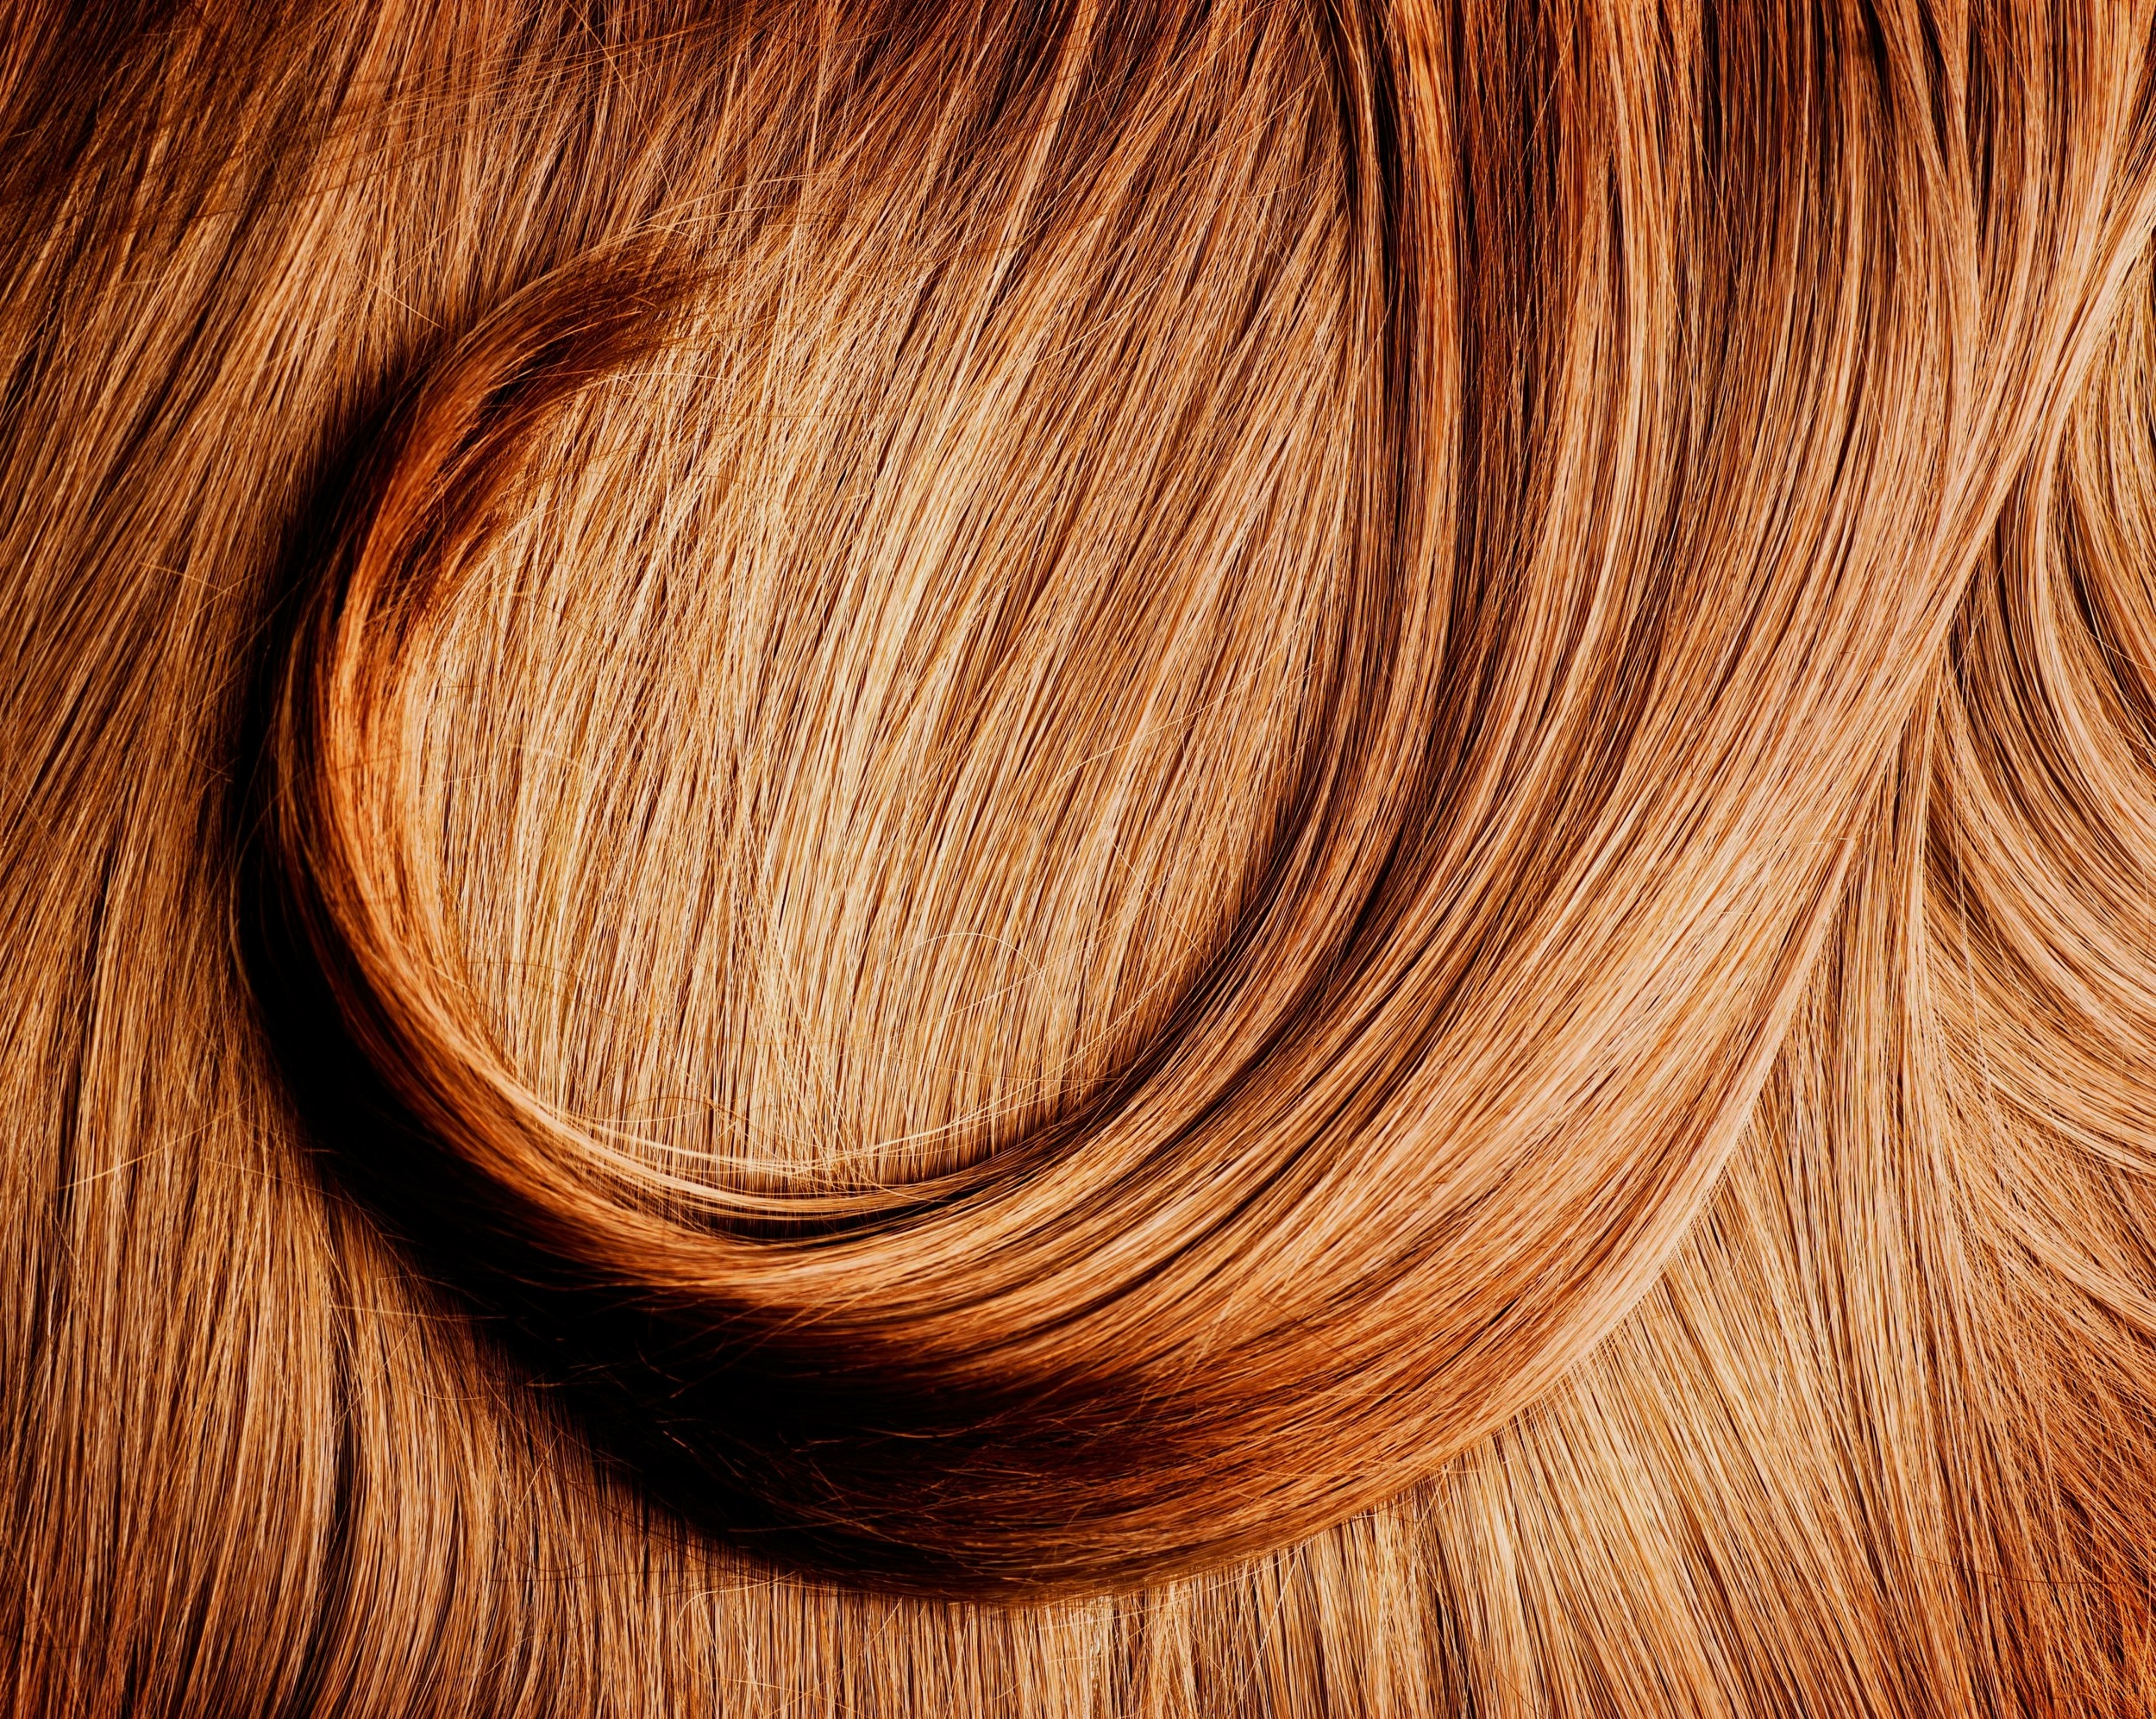 Normal-hair-cloe-up.jpg